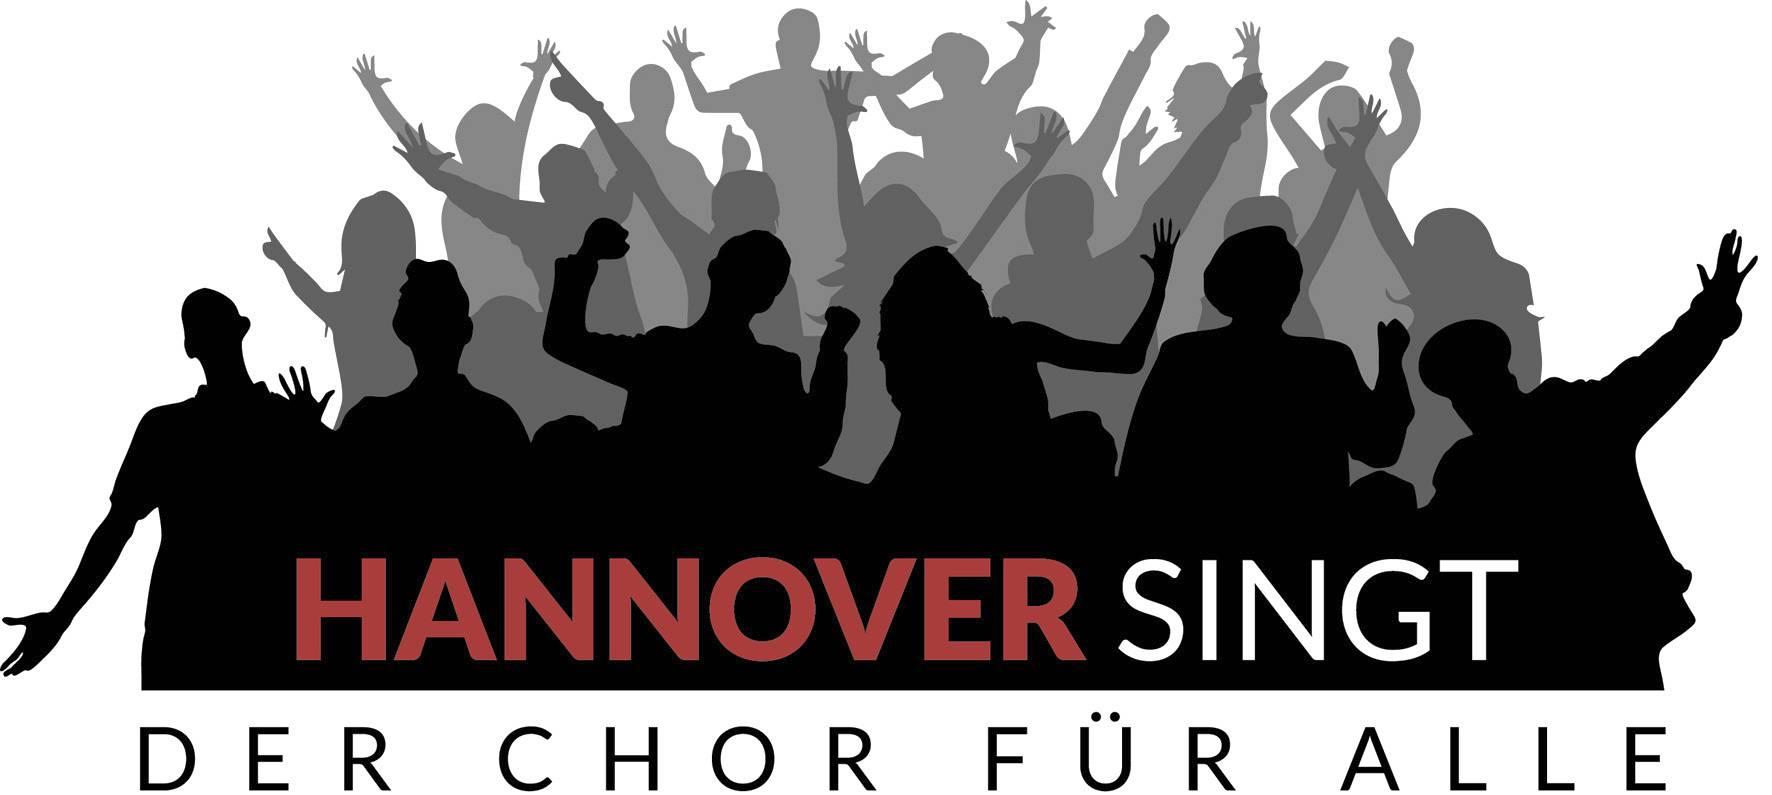 Hannover singt!